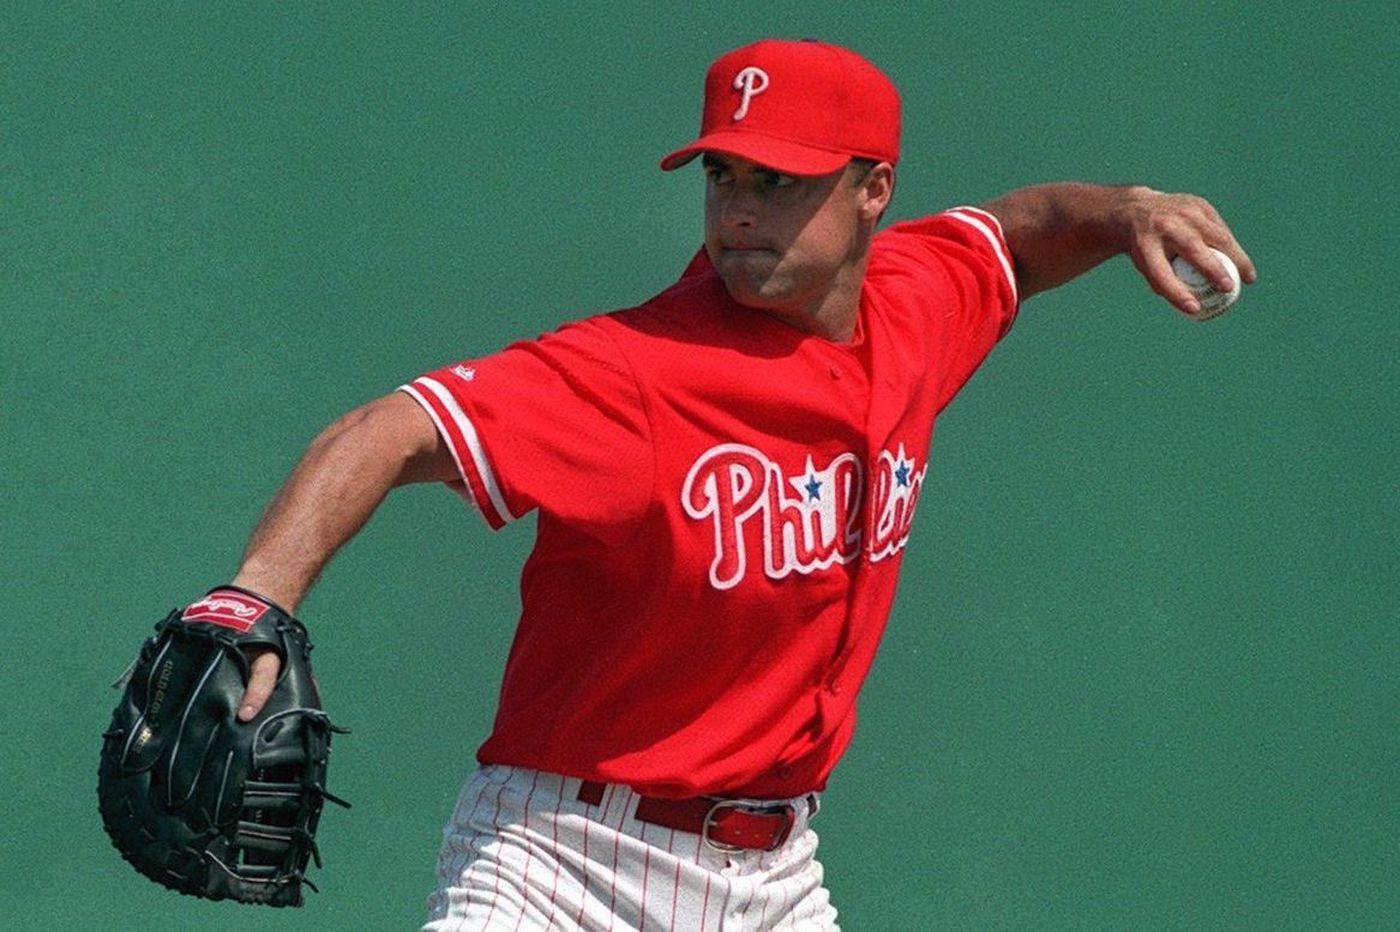 Former Phillies Rico Brogna, Wes Helms return as minor league coaches